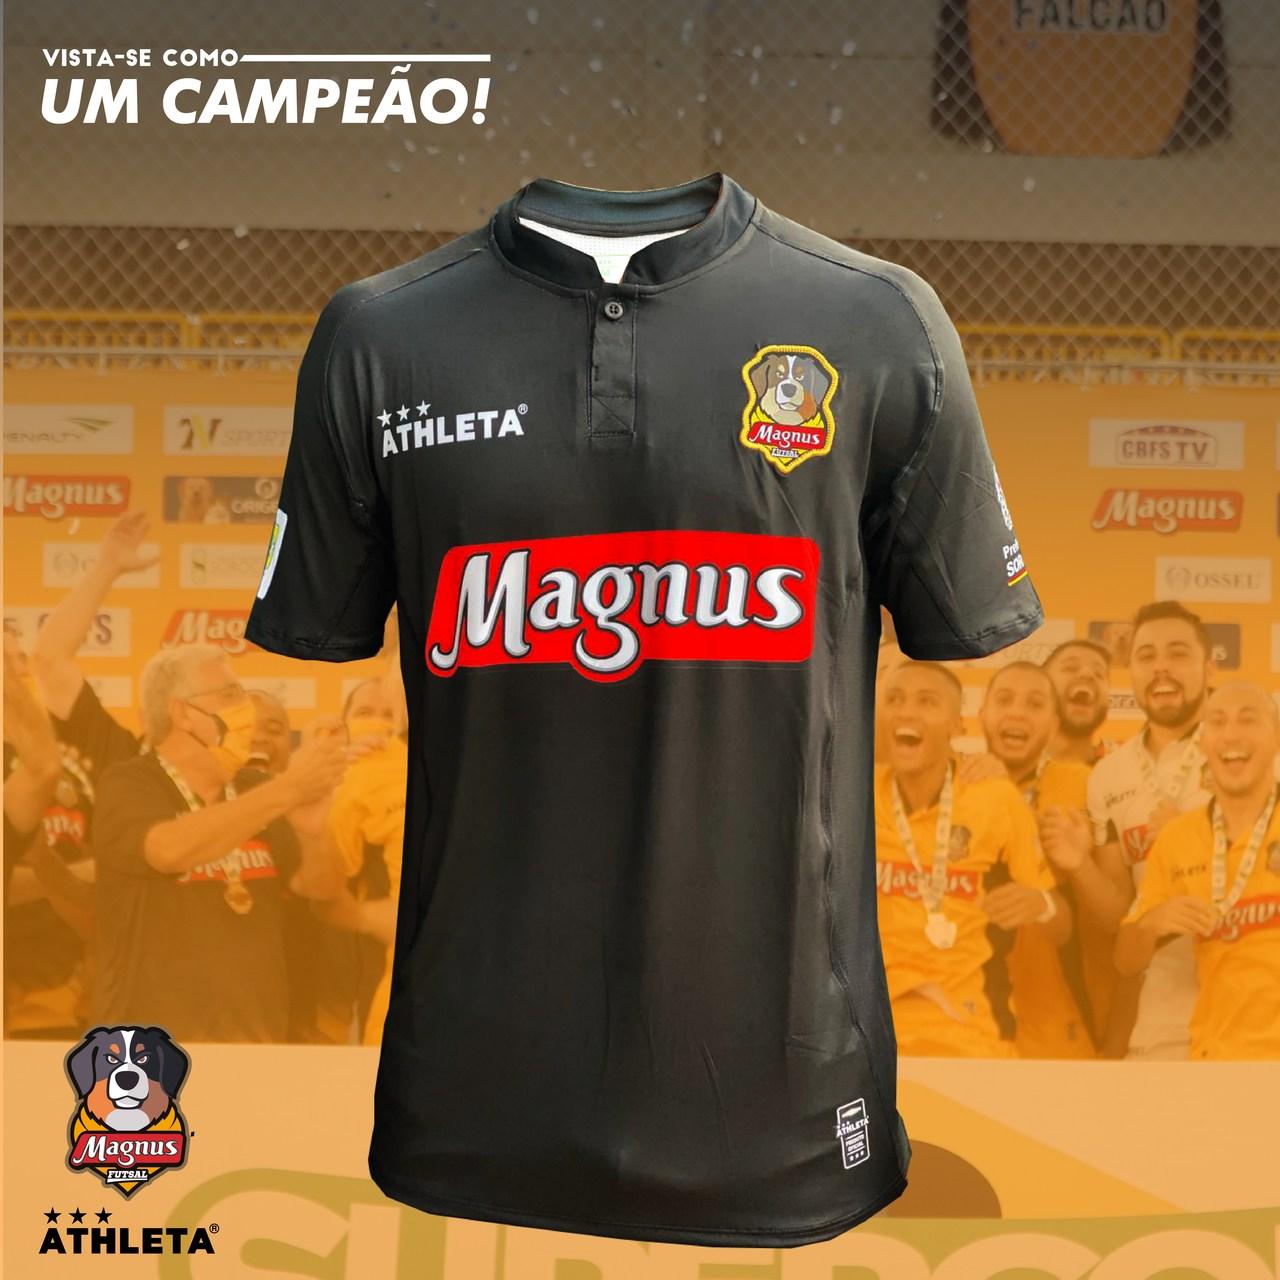 Camisa Magnus Oficial 2021 - Preta - PRÉ VENDA